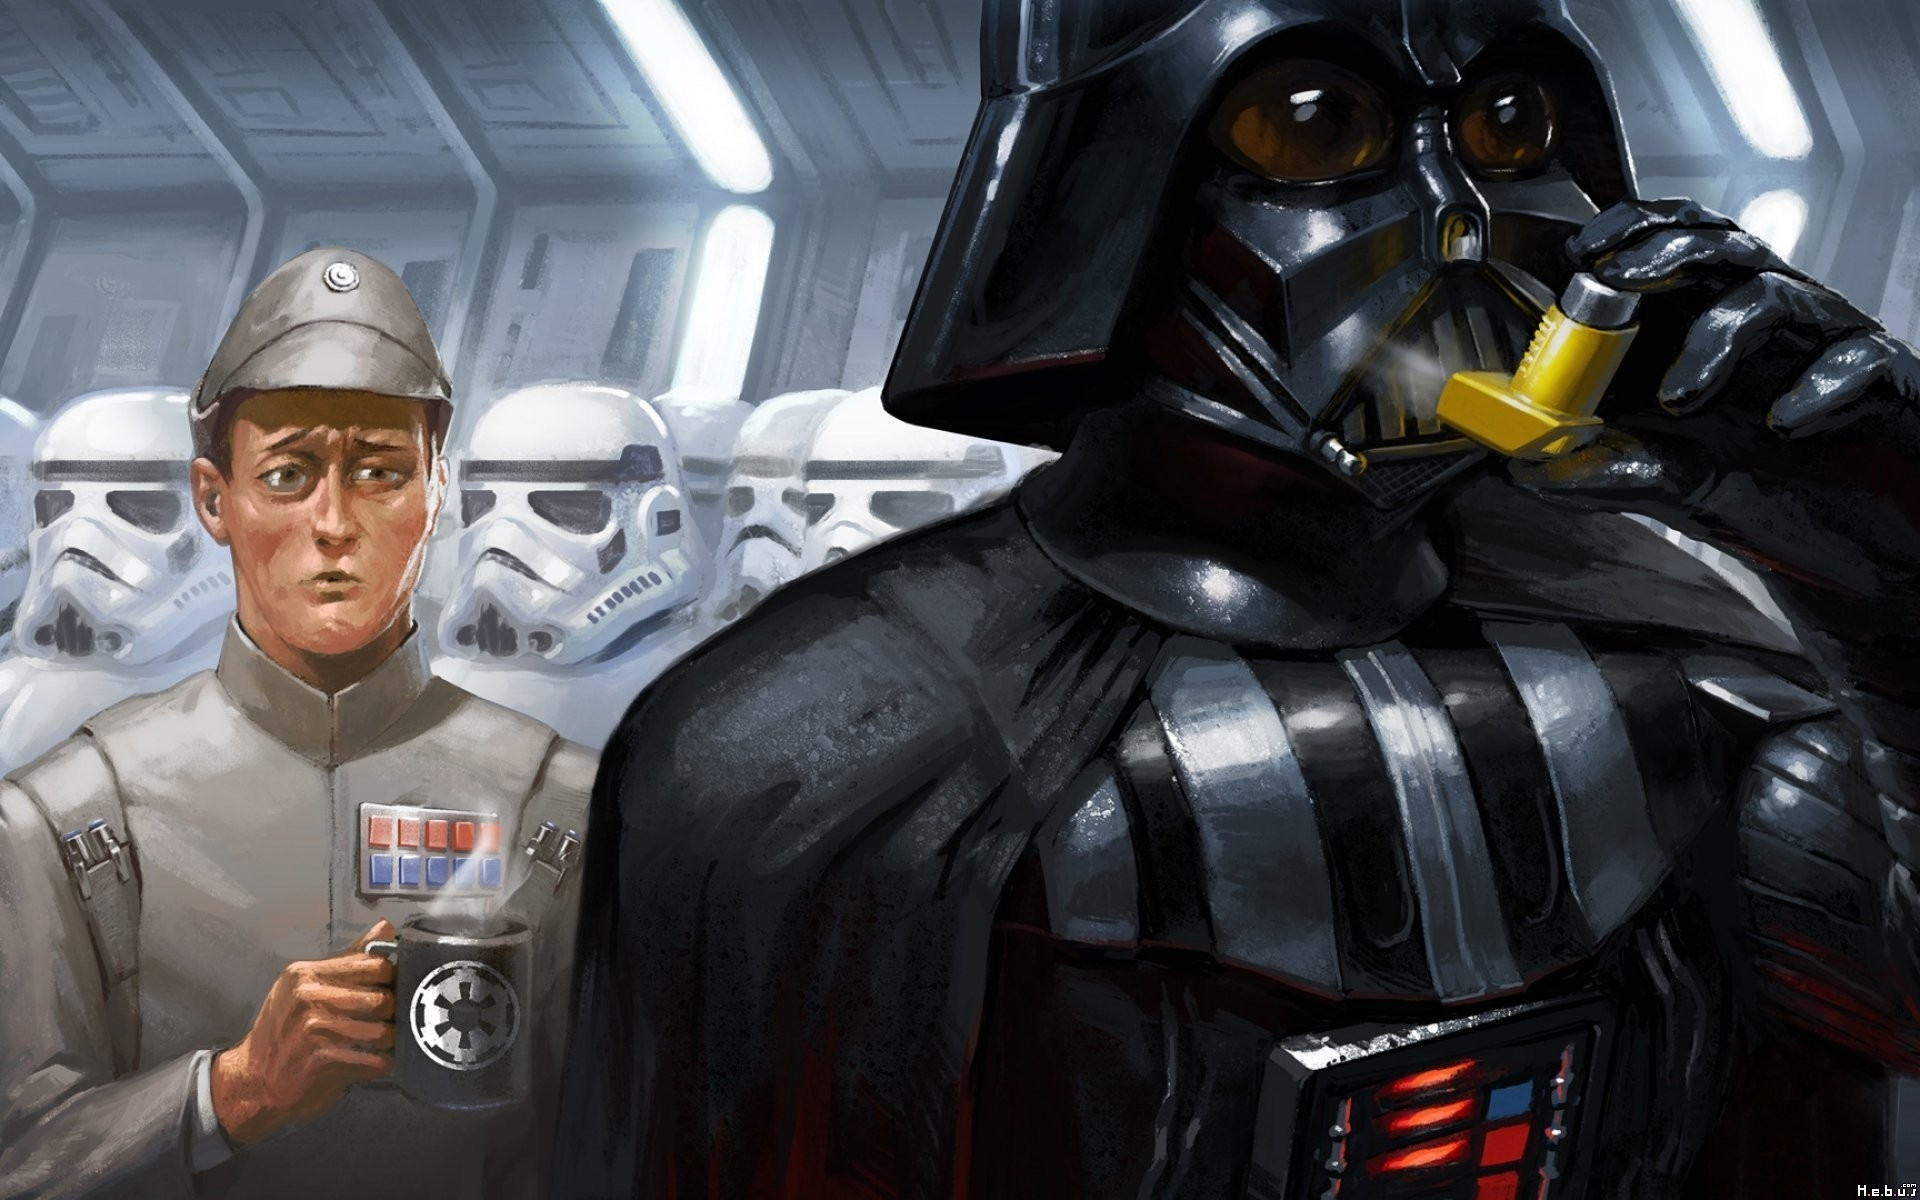 General 1920x1200 Darth Vader stormtrooper humor Star Wars cup Star Wars Humor